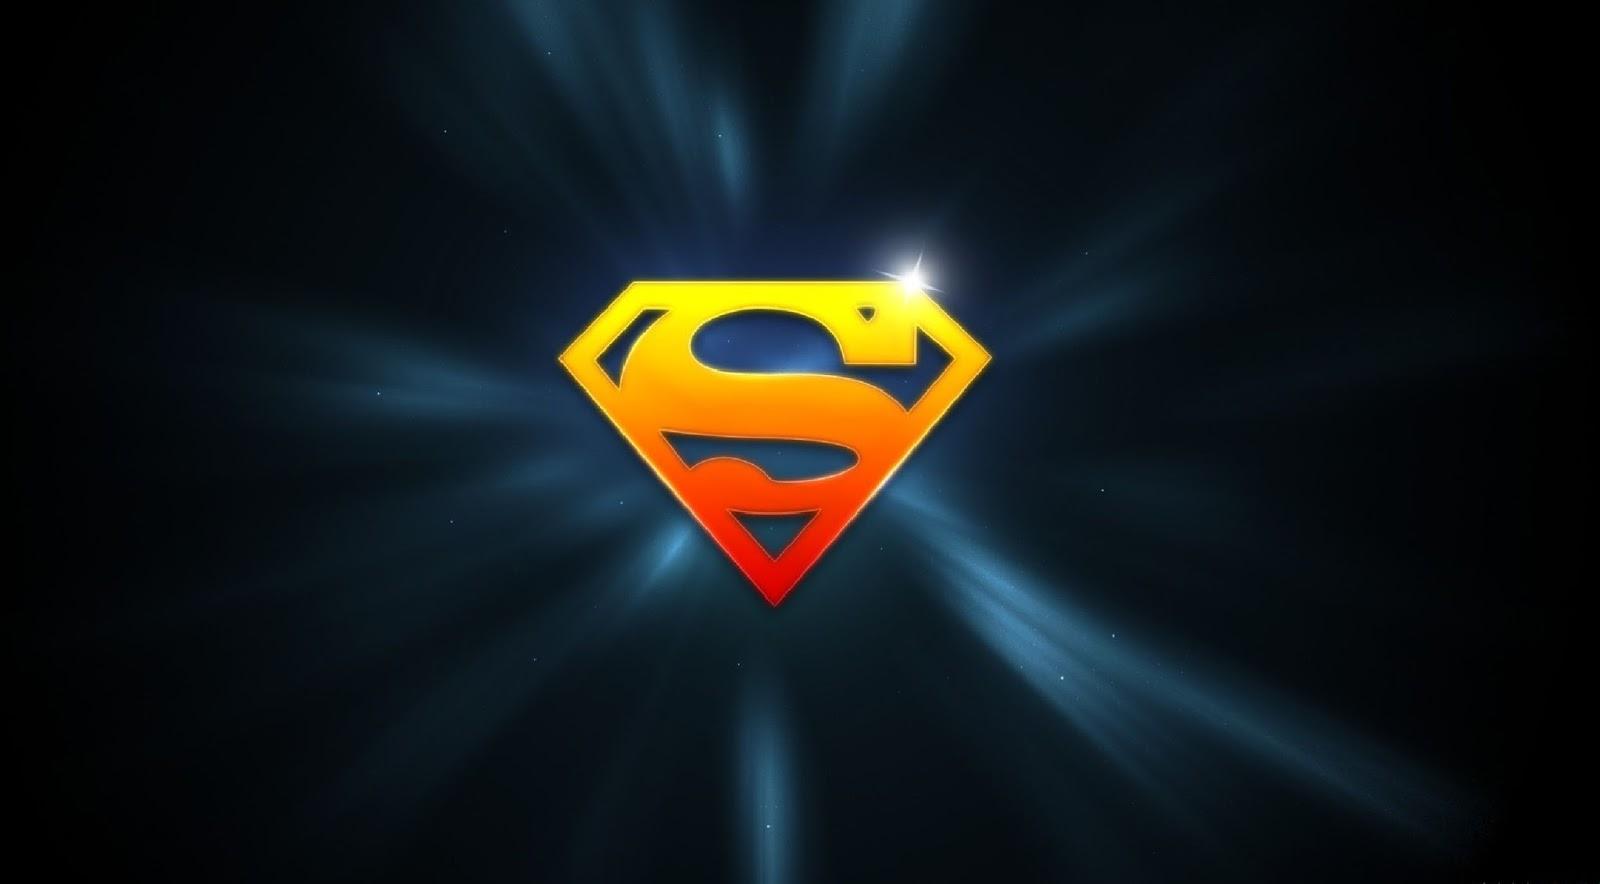 GAMBAR LOGO KEREN SUPERMAN Gambar Kartun Lucu Dan Wallpaper